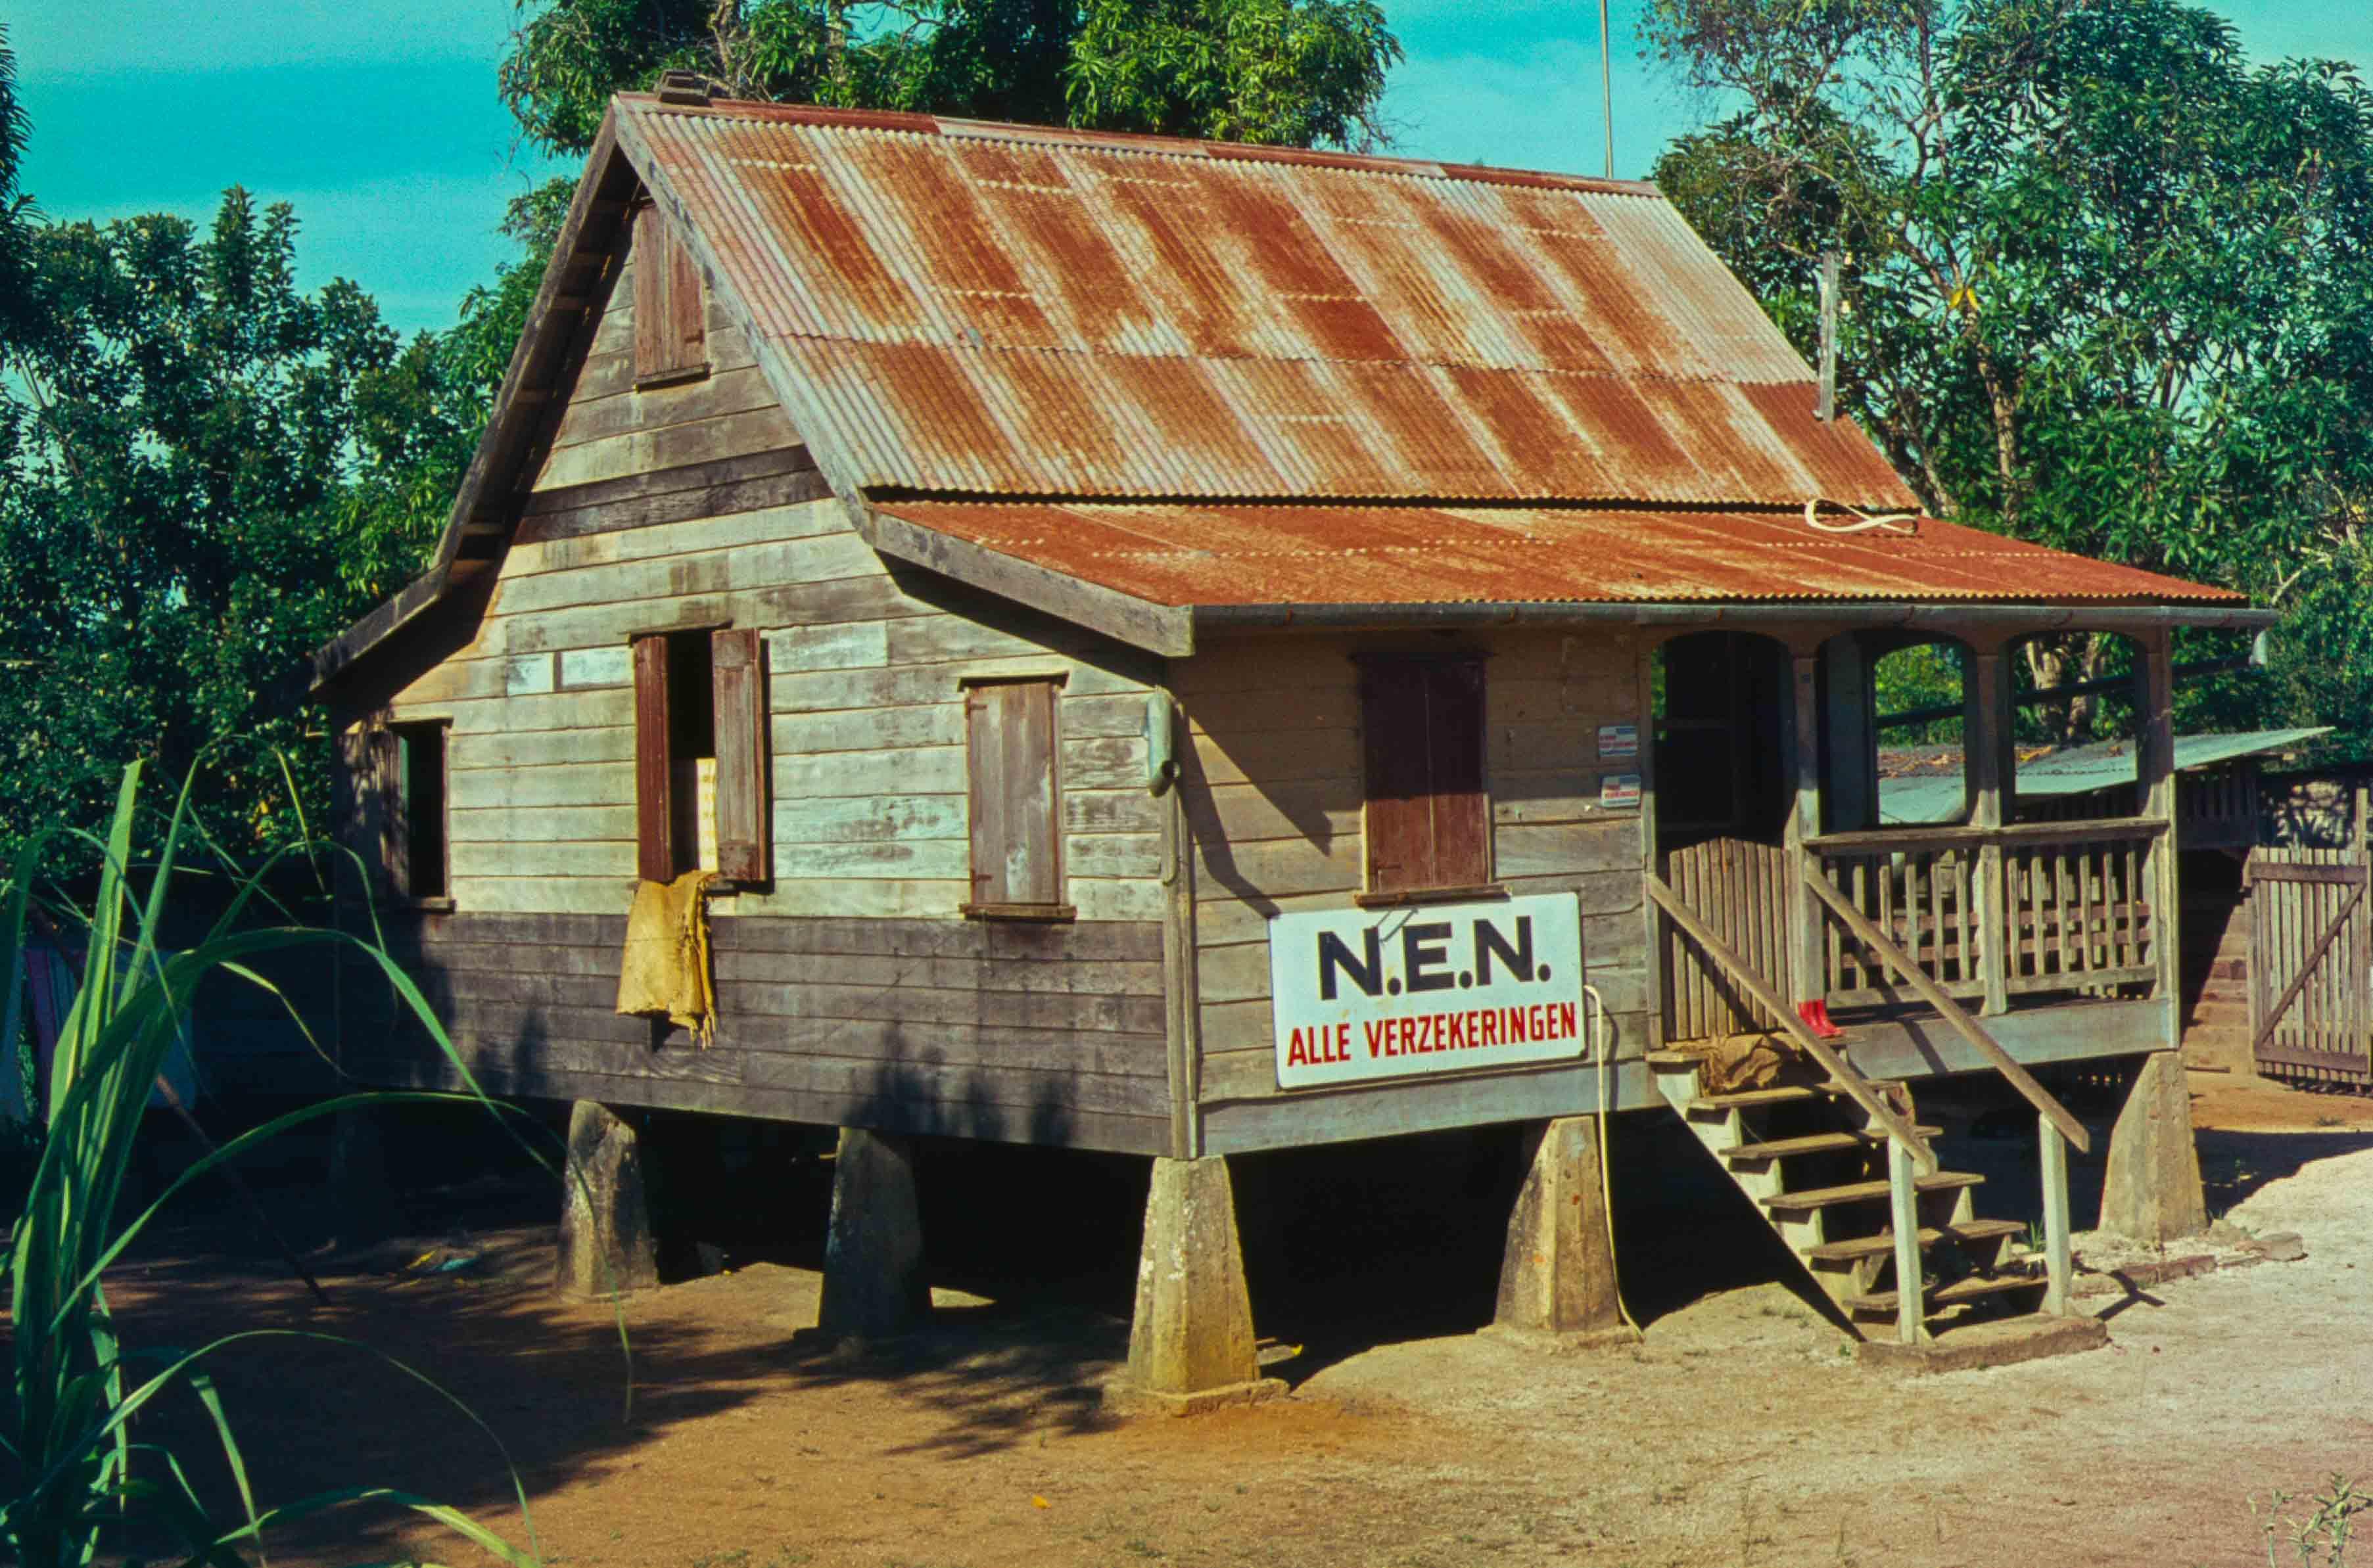 212. Suriname